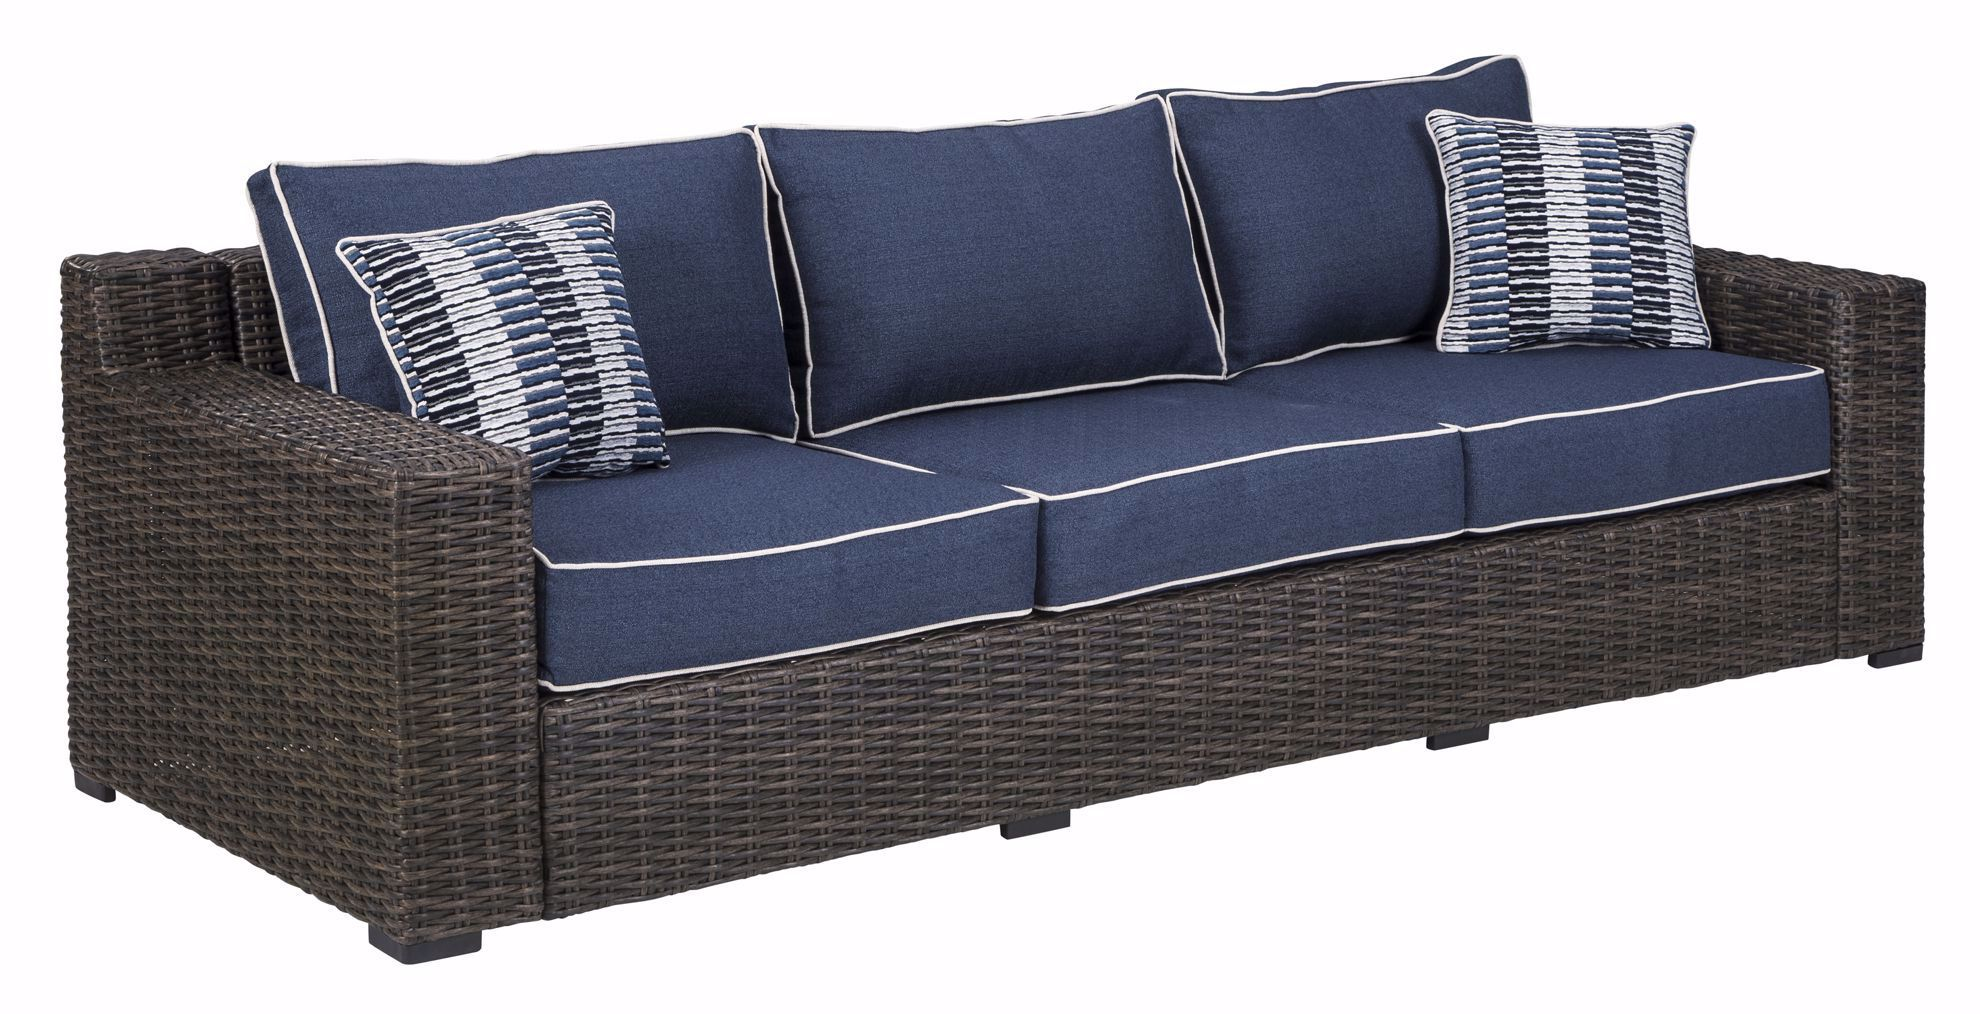 Picture of Grasson Lane Cushion Sofa